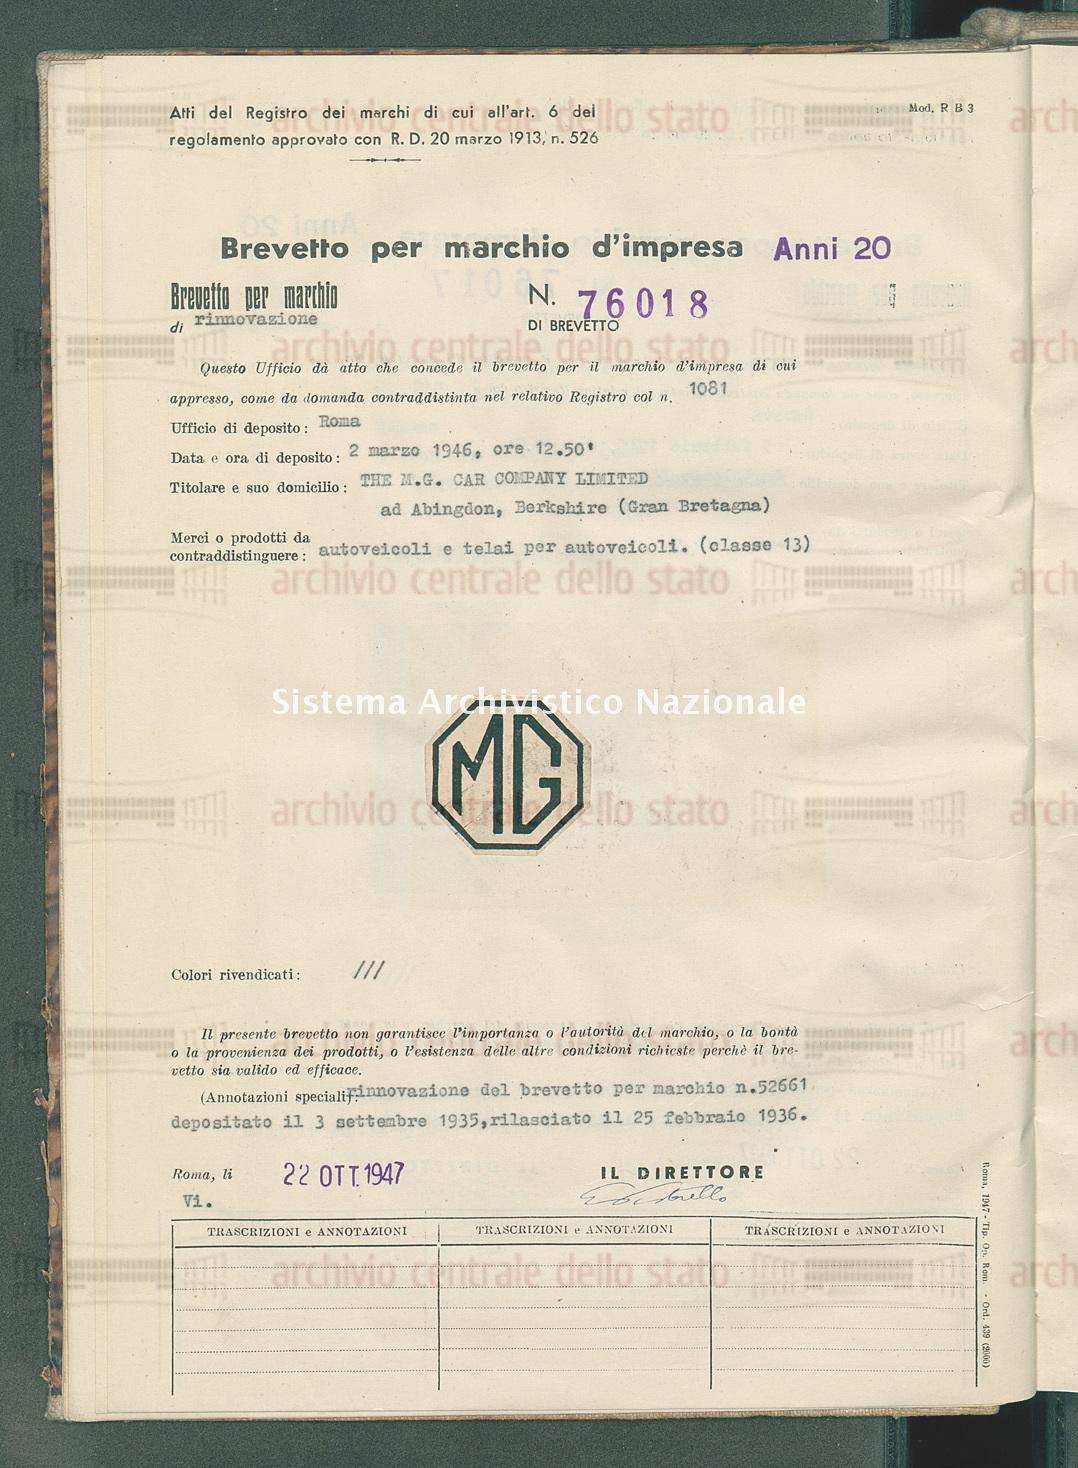 Autoveicoli e telai per autoveicoli The M.G. Car Company Limited (22/10/1947)